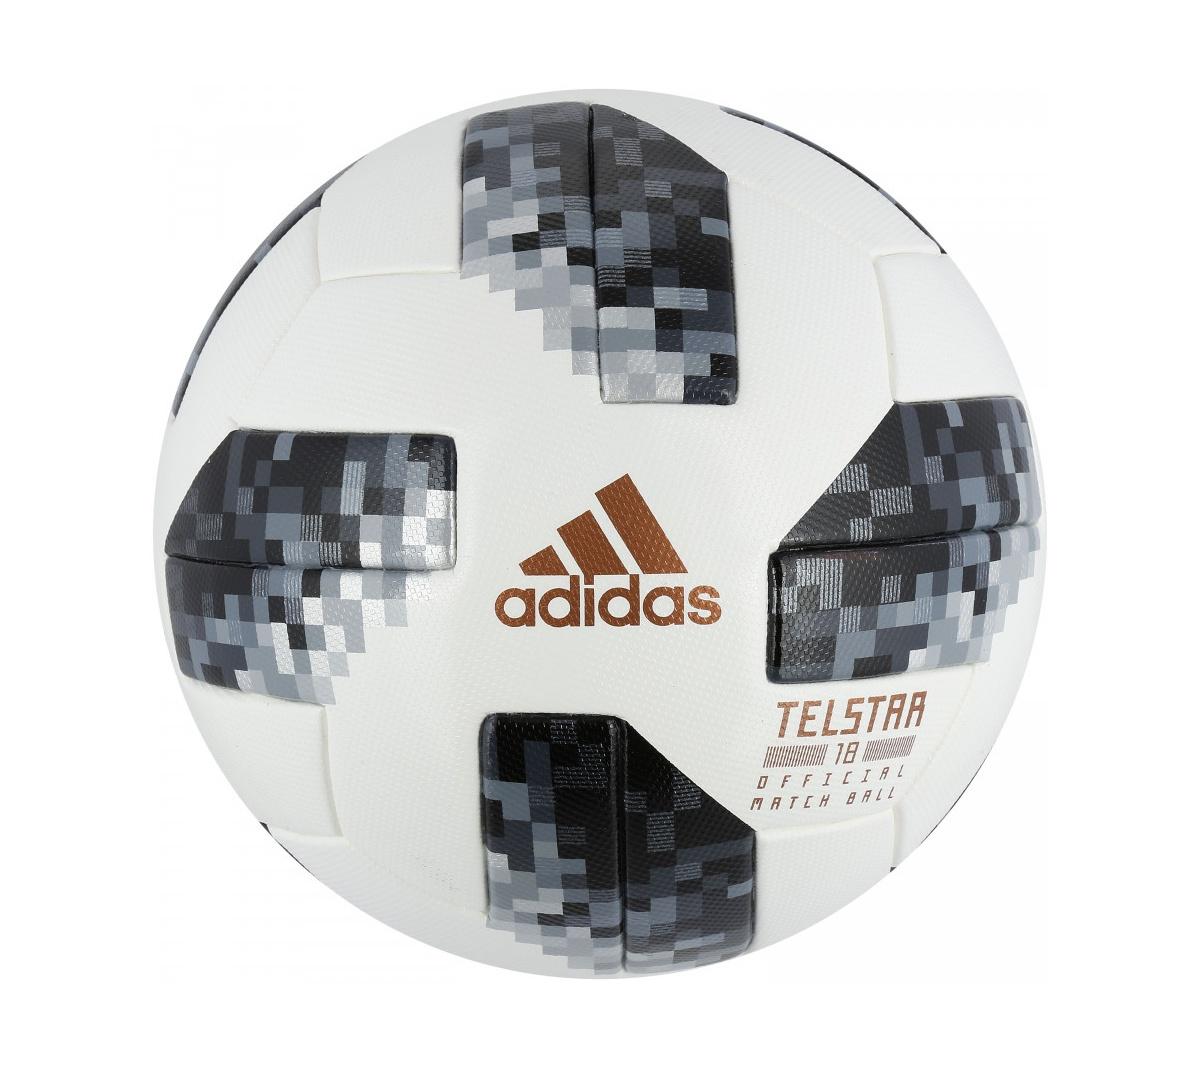 2ad9ed3d4 ... Bola de Futebol de Campo Telstar Oficial Copa do Mundo FIFA 2018 adidas  OMB ...